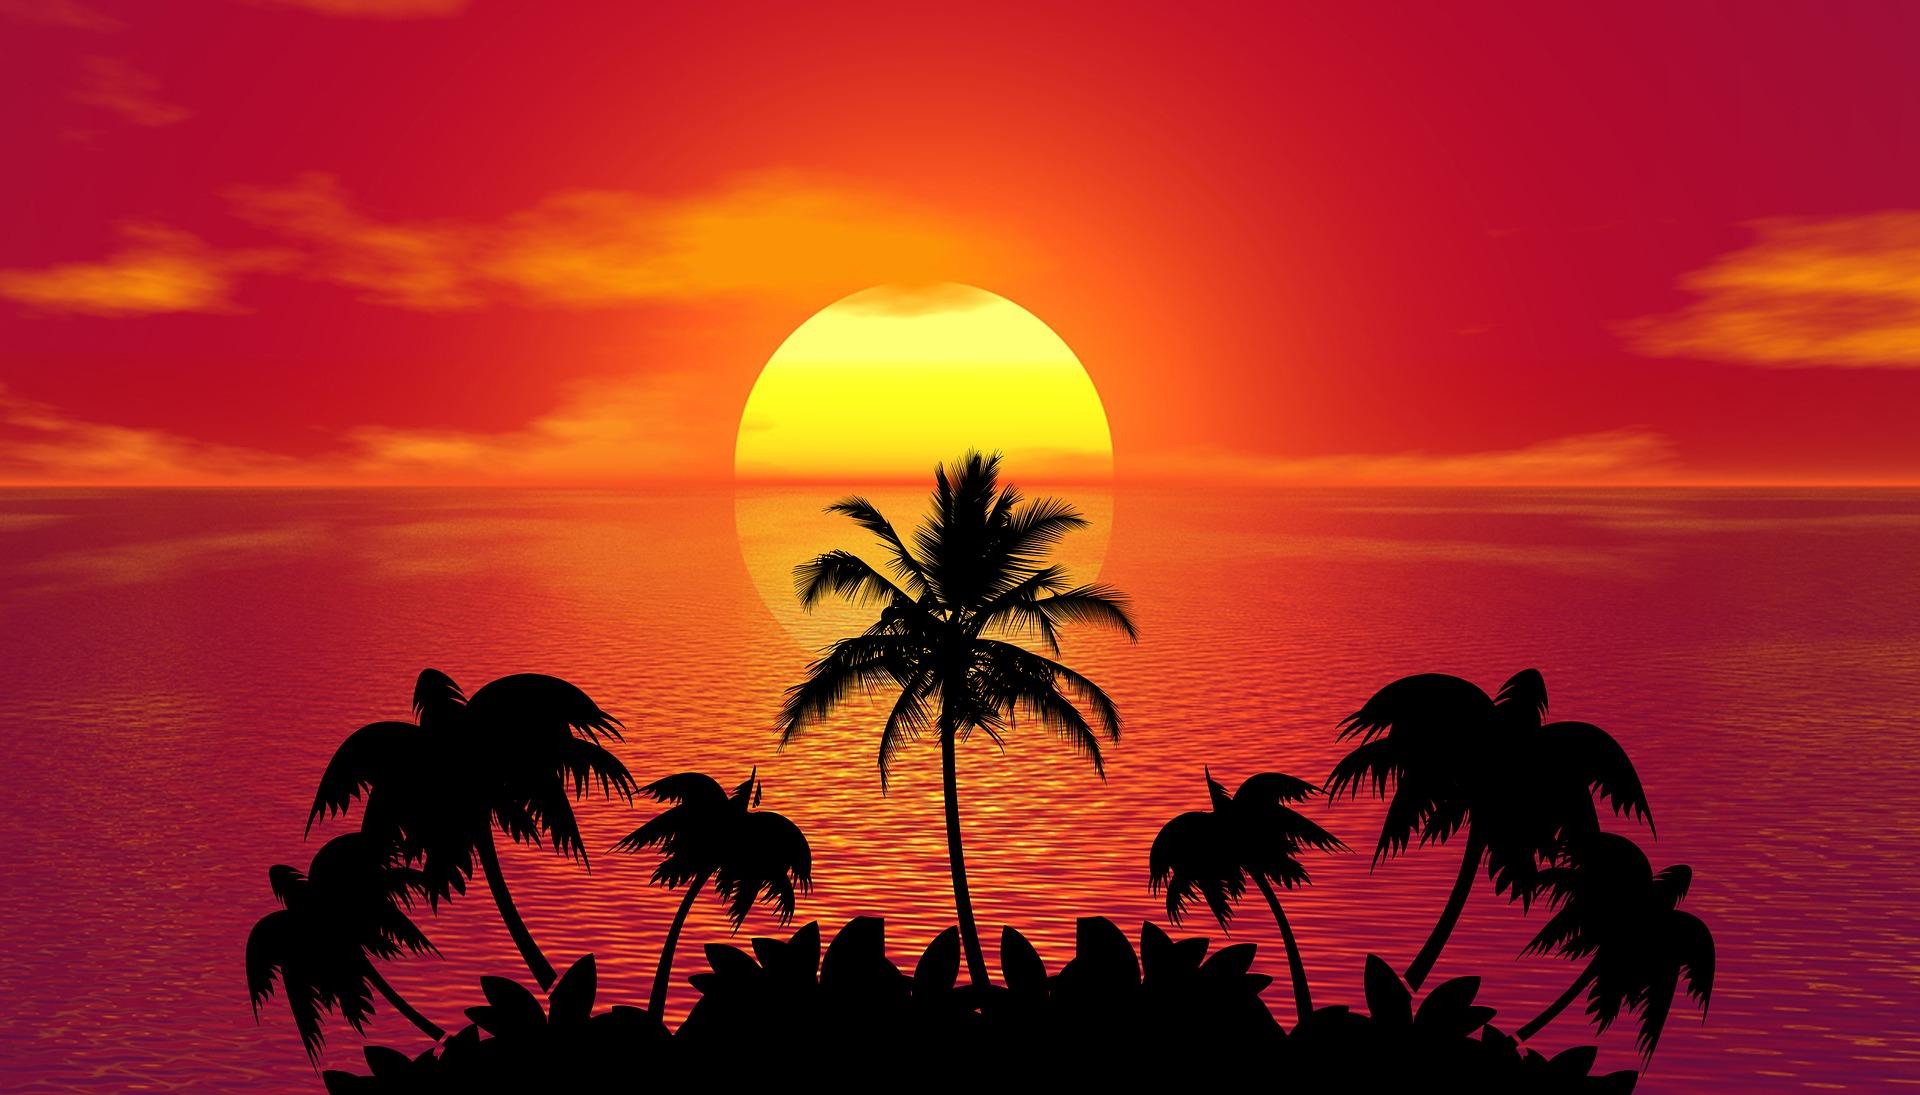 tropical-1651426_1920